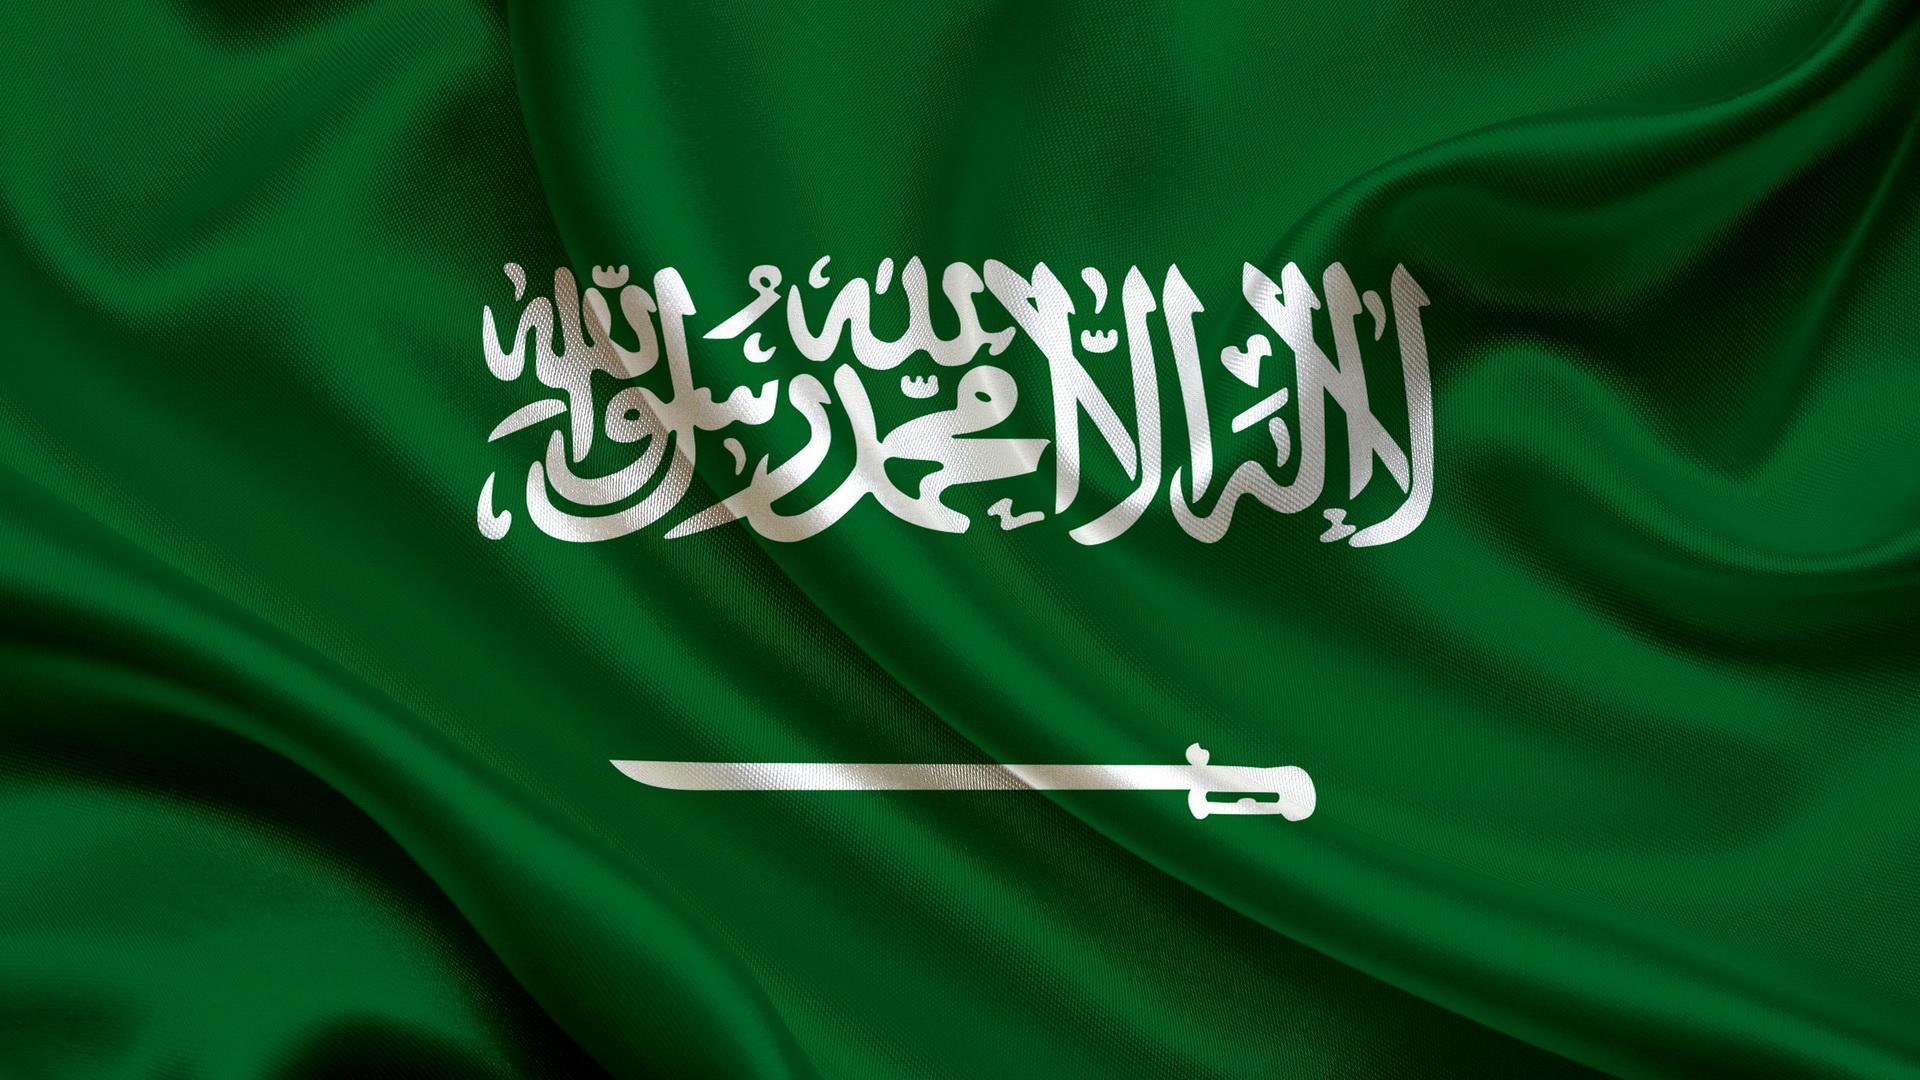 ��� ��� �������� , ������ ������� �������� , ��� ������ ���� �������� 2016 , Saudi Arabia new_1422293457_601.j